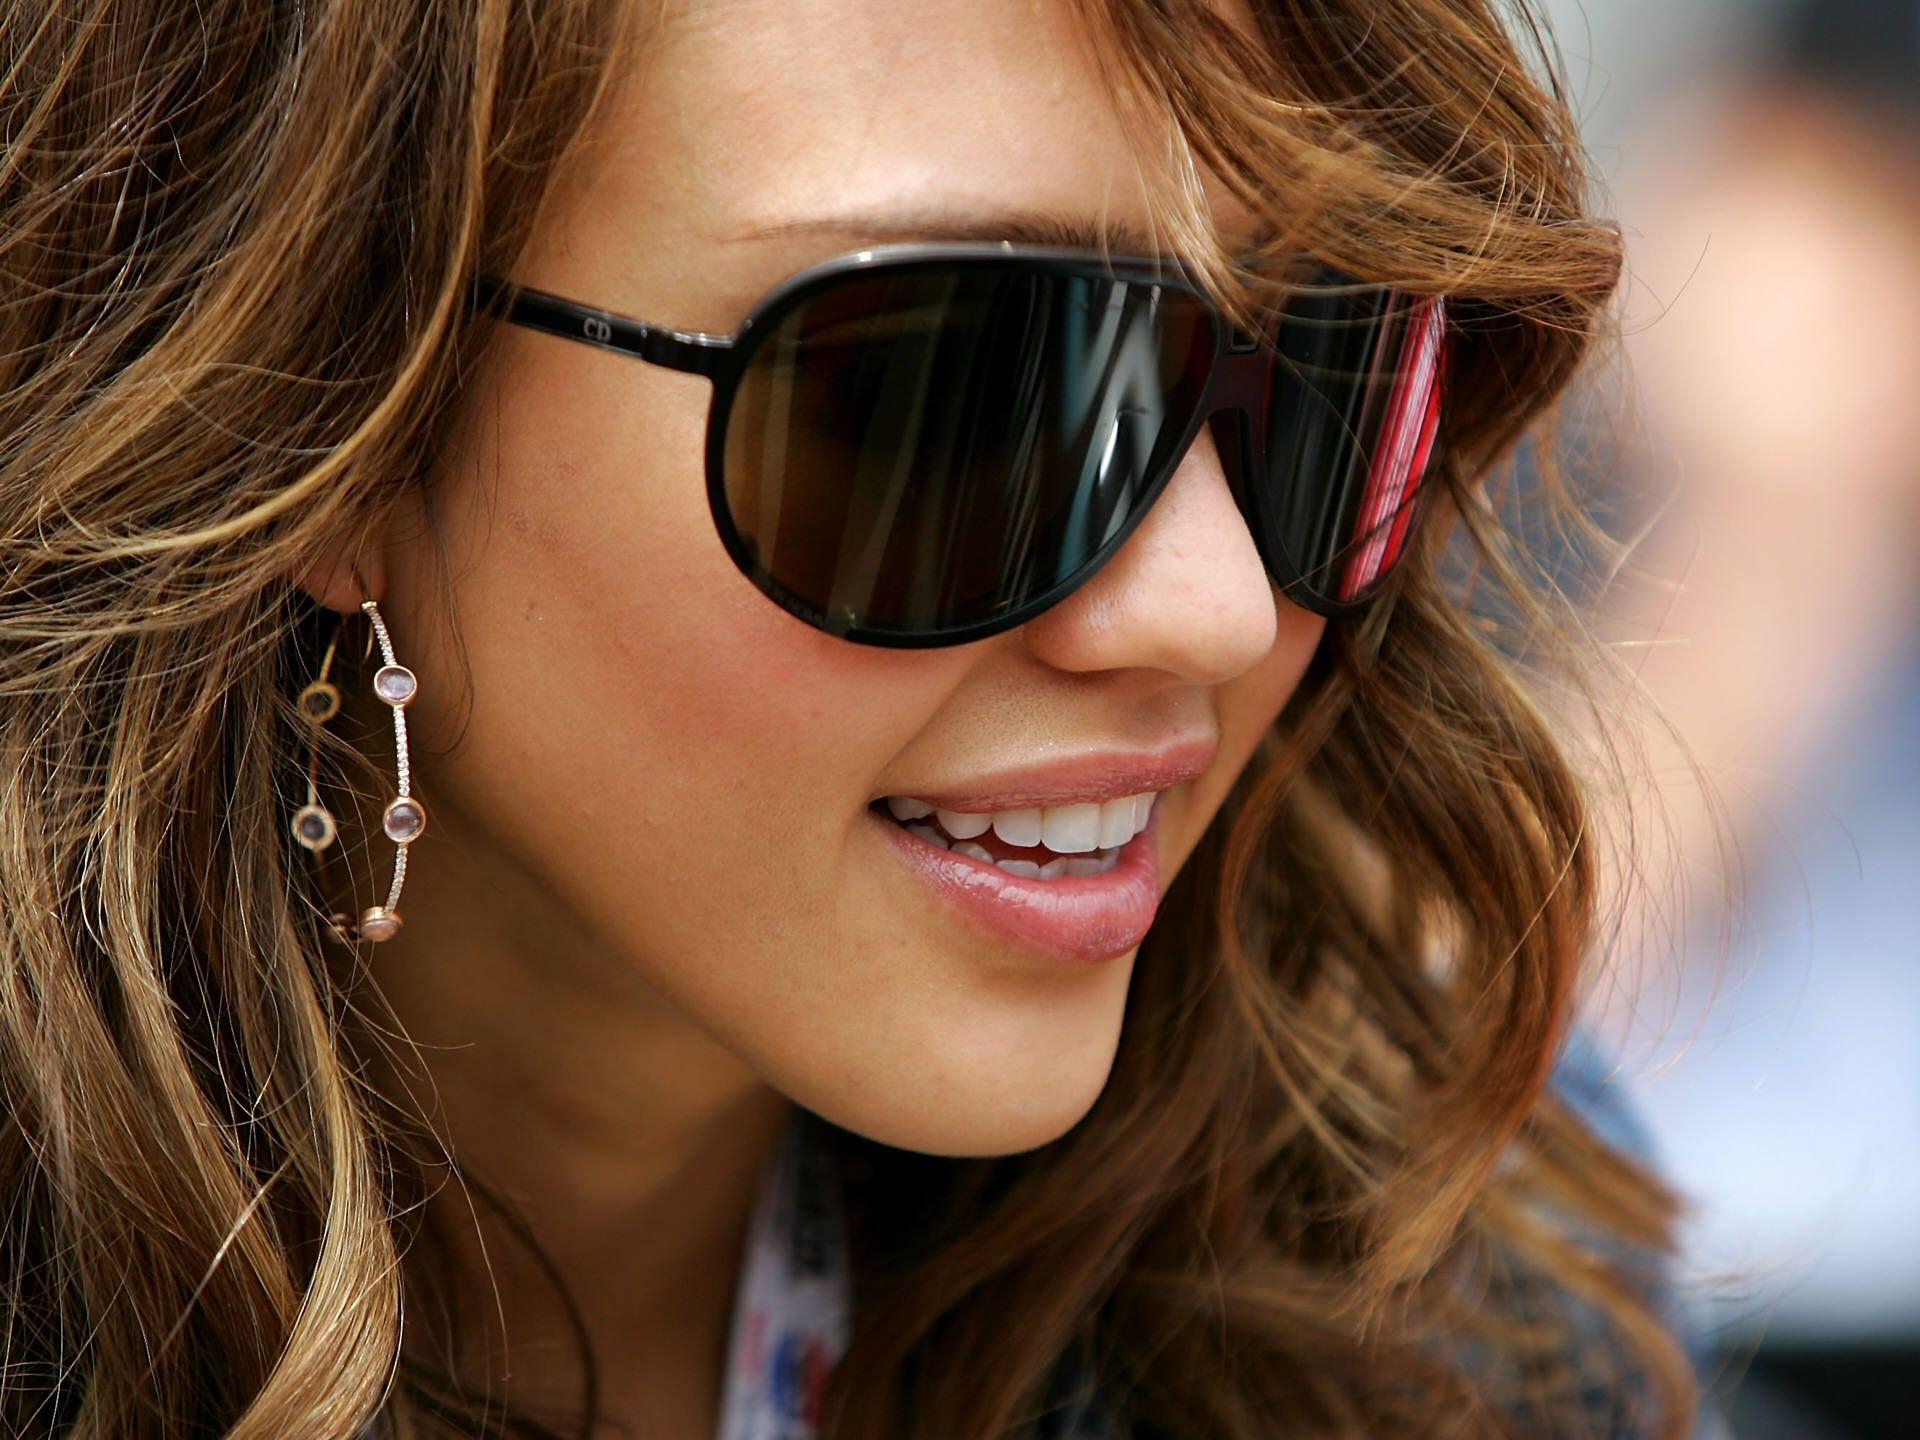 jessica alba oblong face shape sunglasses Accessories